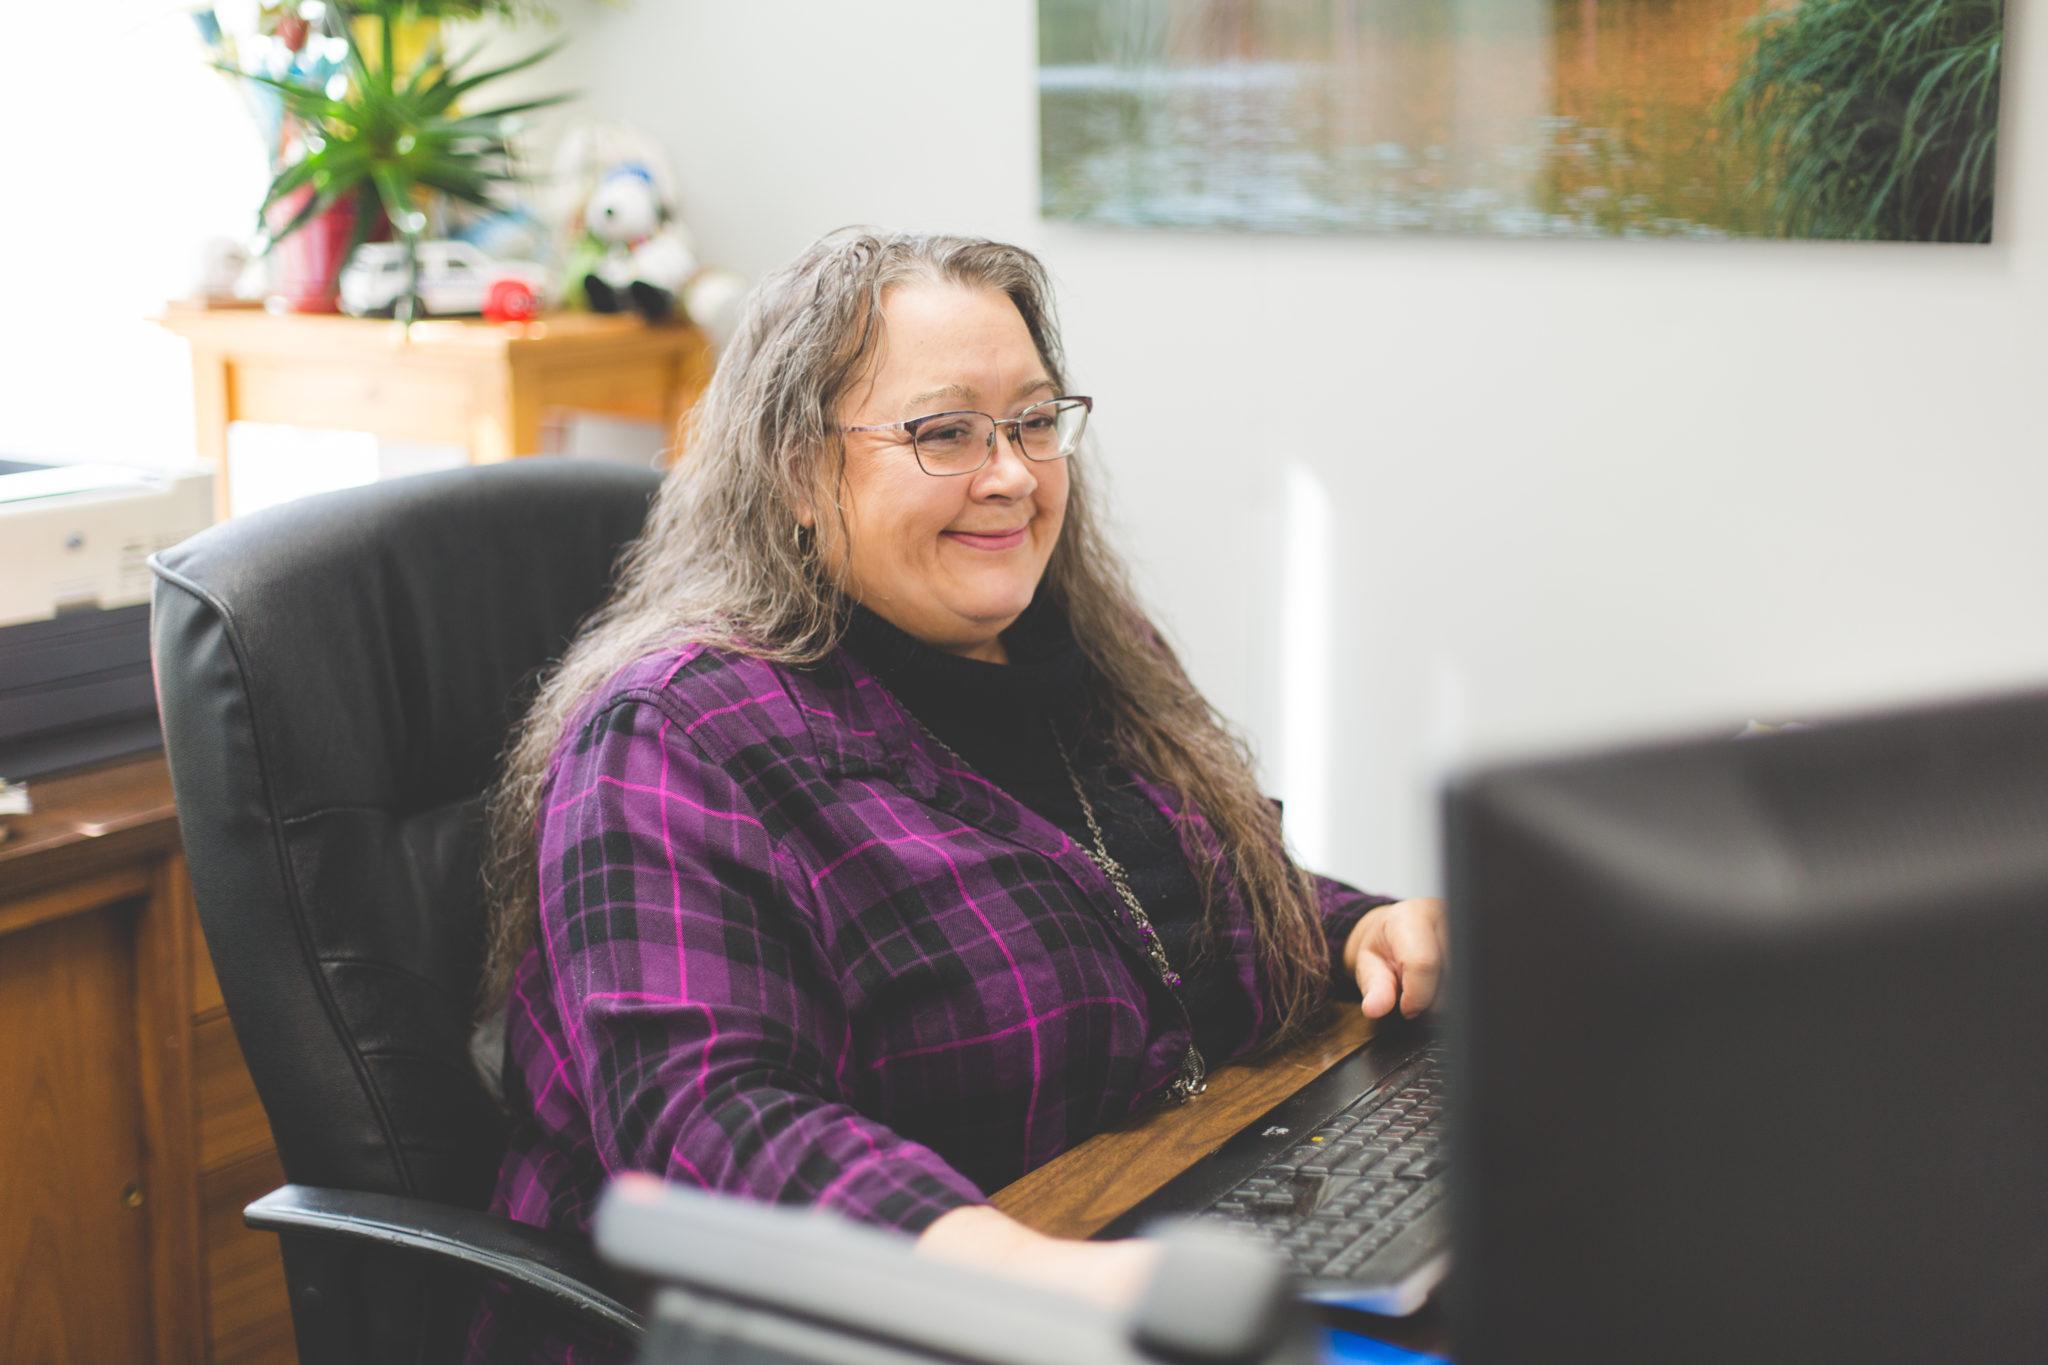 Erin Okeefe | Insurance Advisors Of St. Louis | IASTL